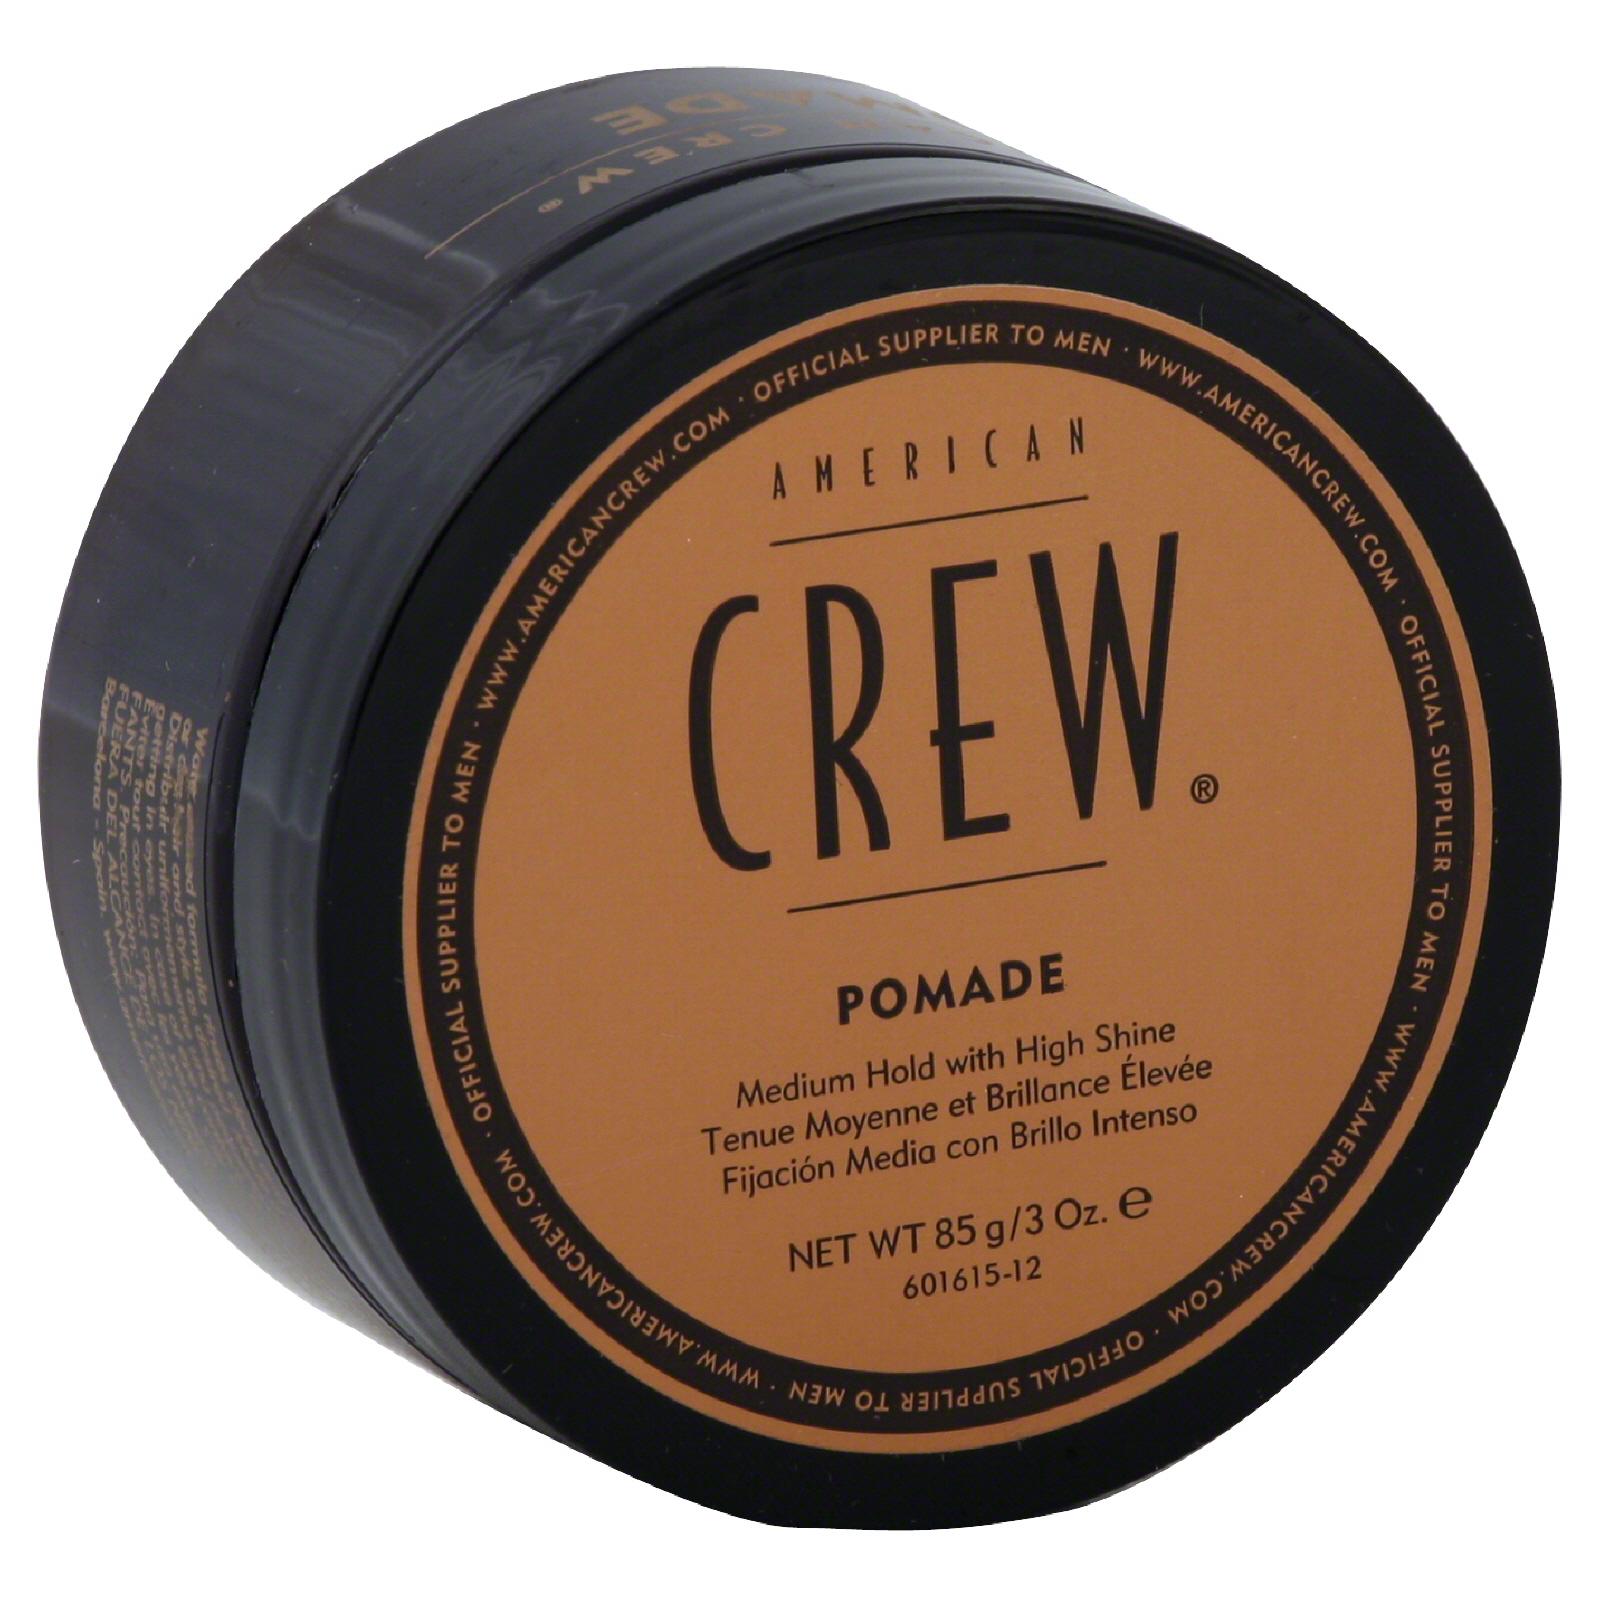 American Crew Pomade Hold & Shine Men - 3 Oz